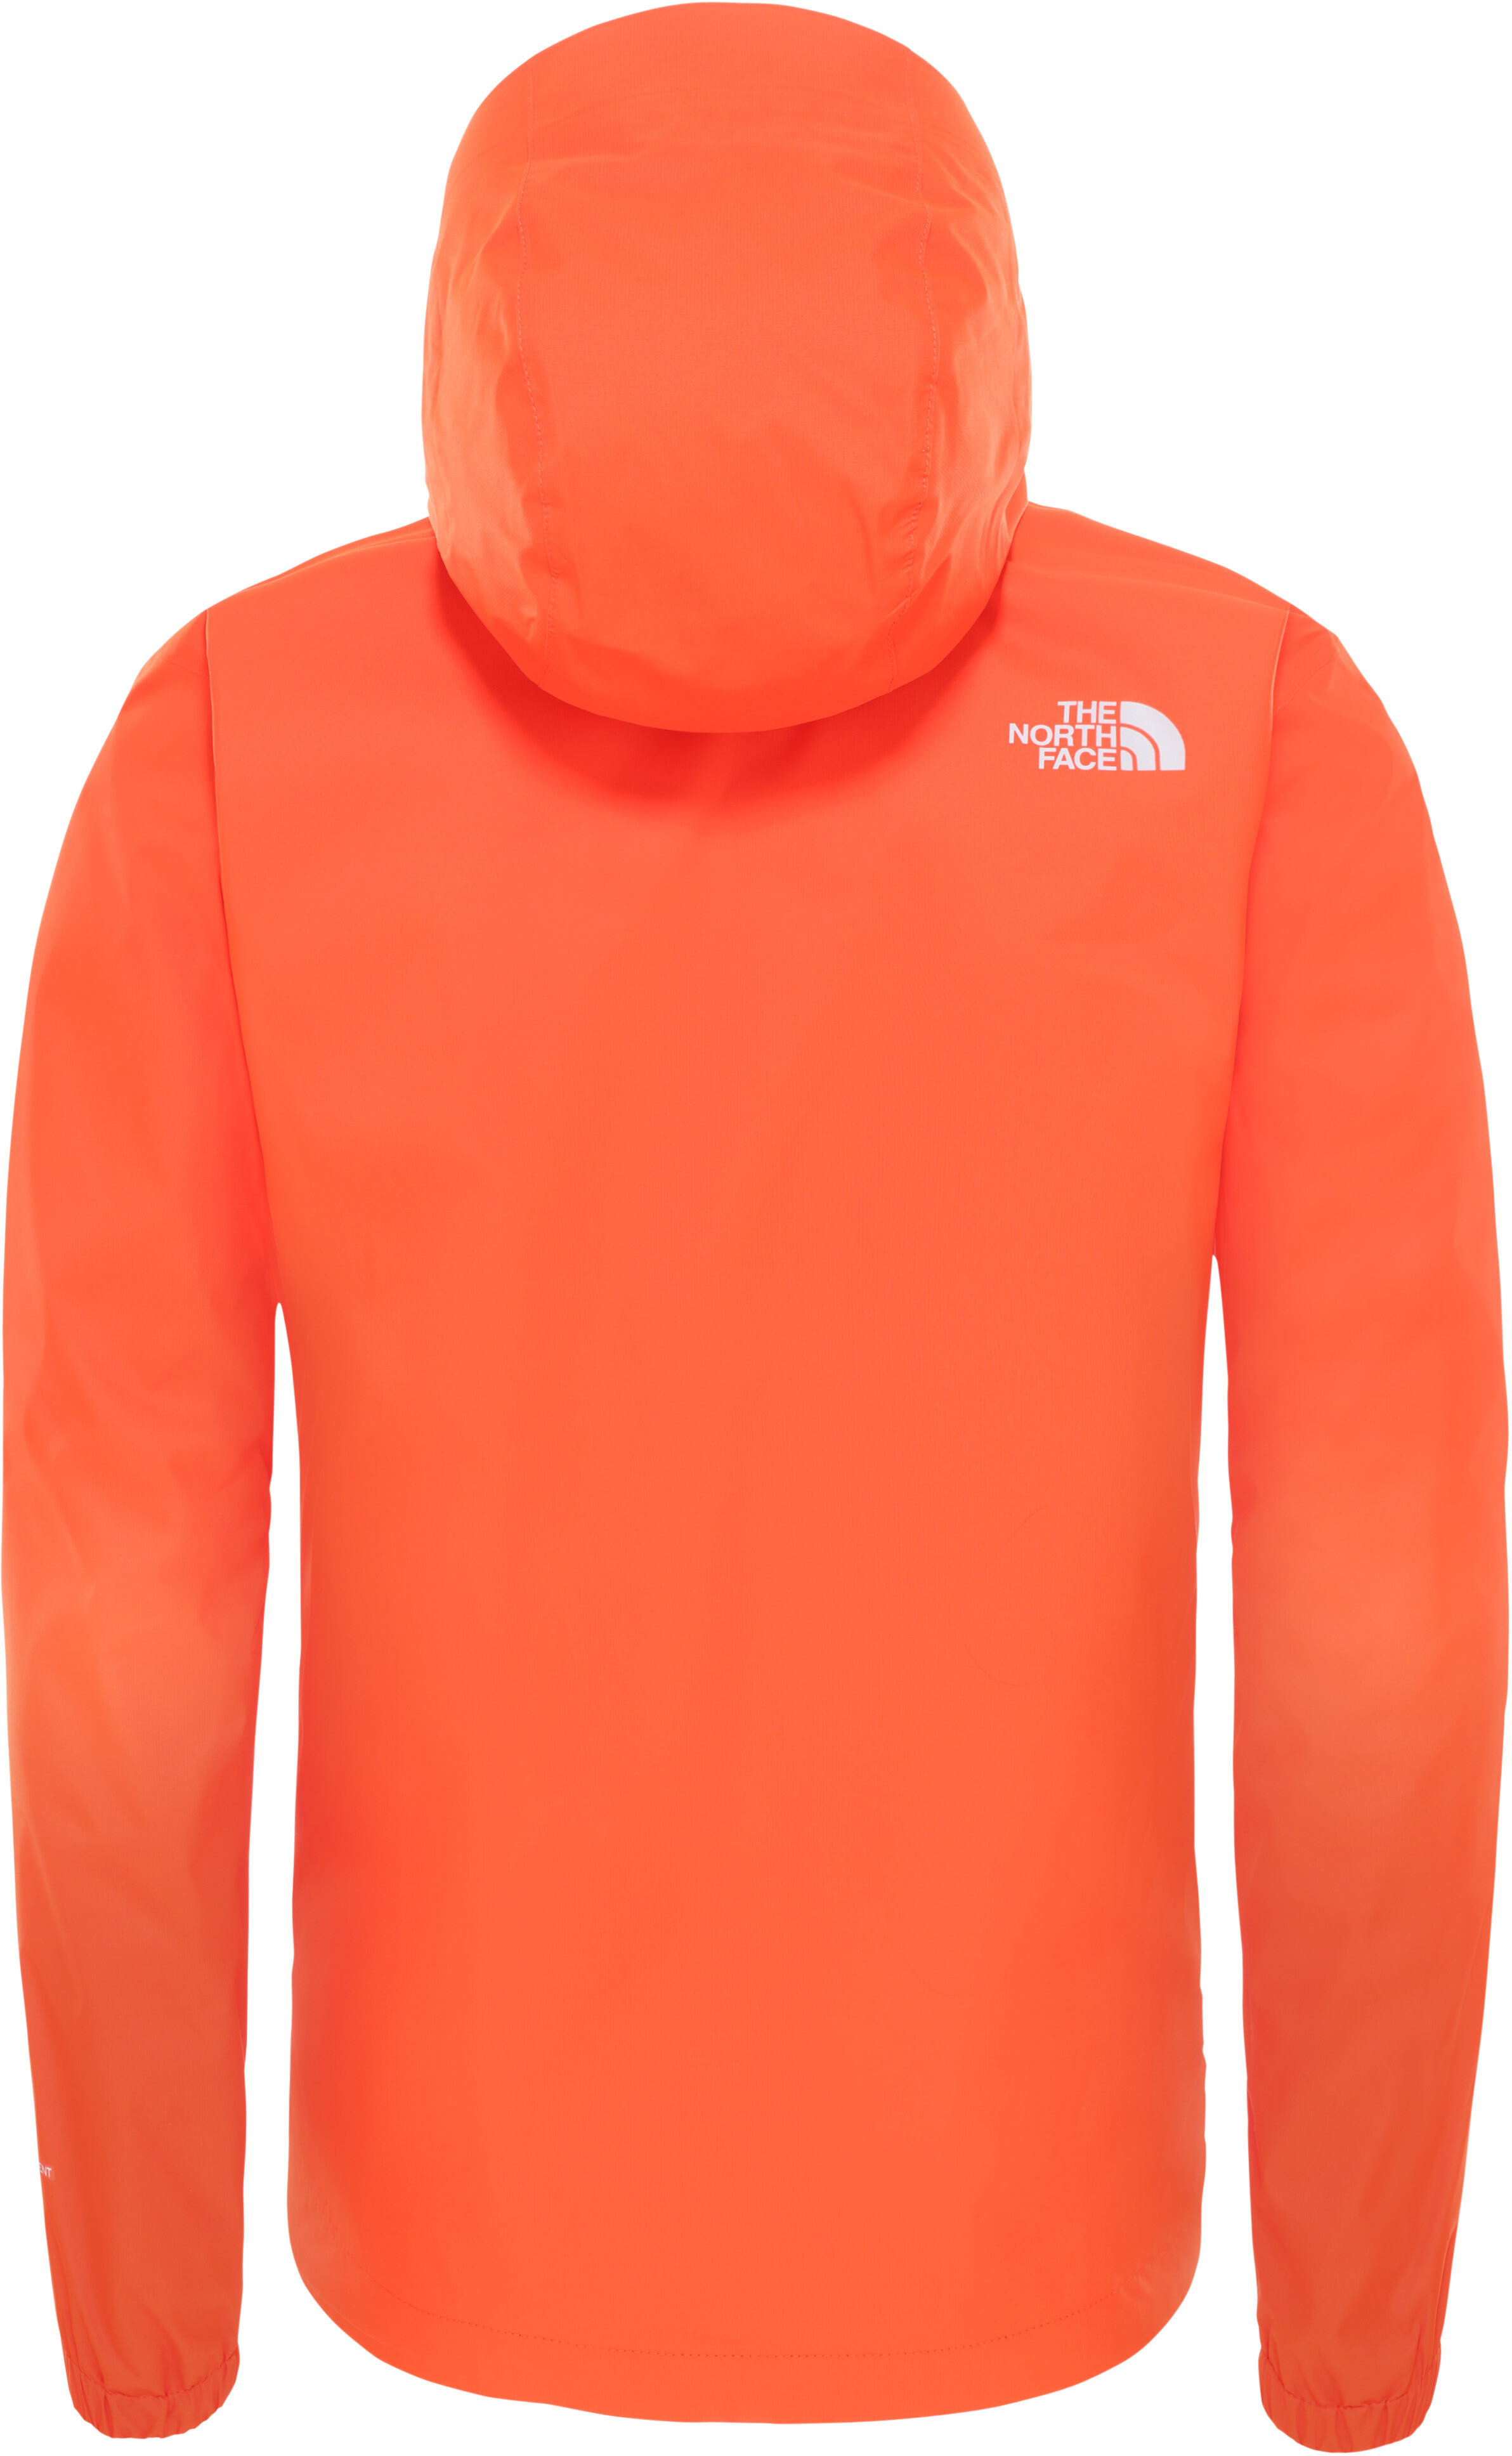 450d4b05e2 The North Face Quest Jacket Men acrylic orange at Addnature.co.uk